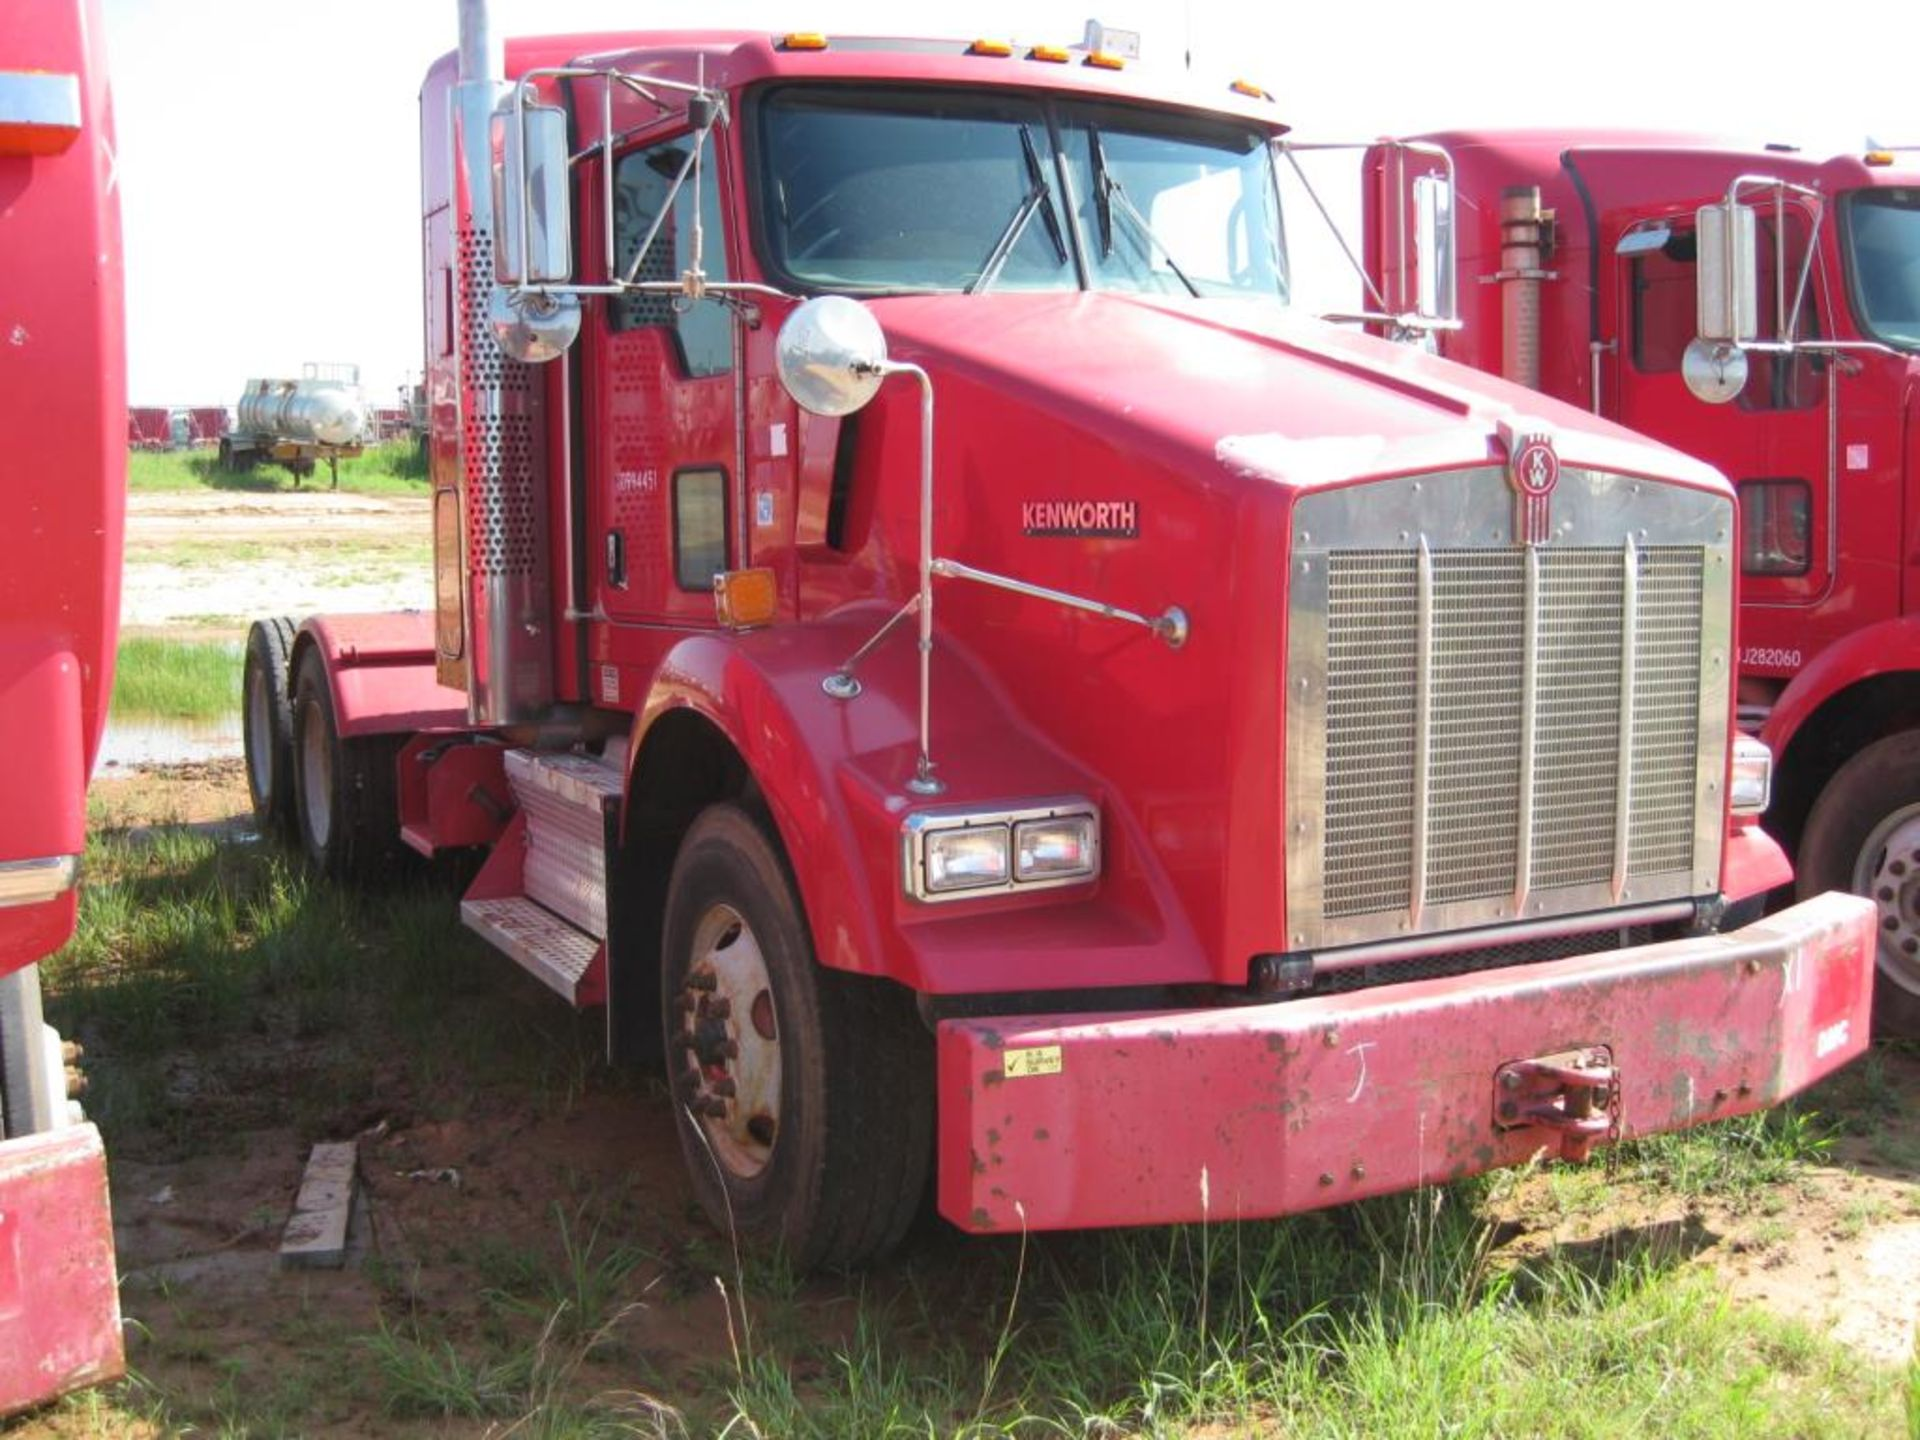 Kenworth Truck - Image 2 of 21